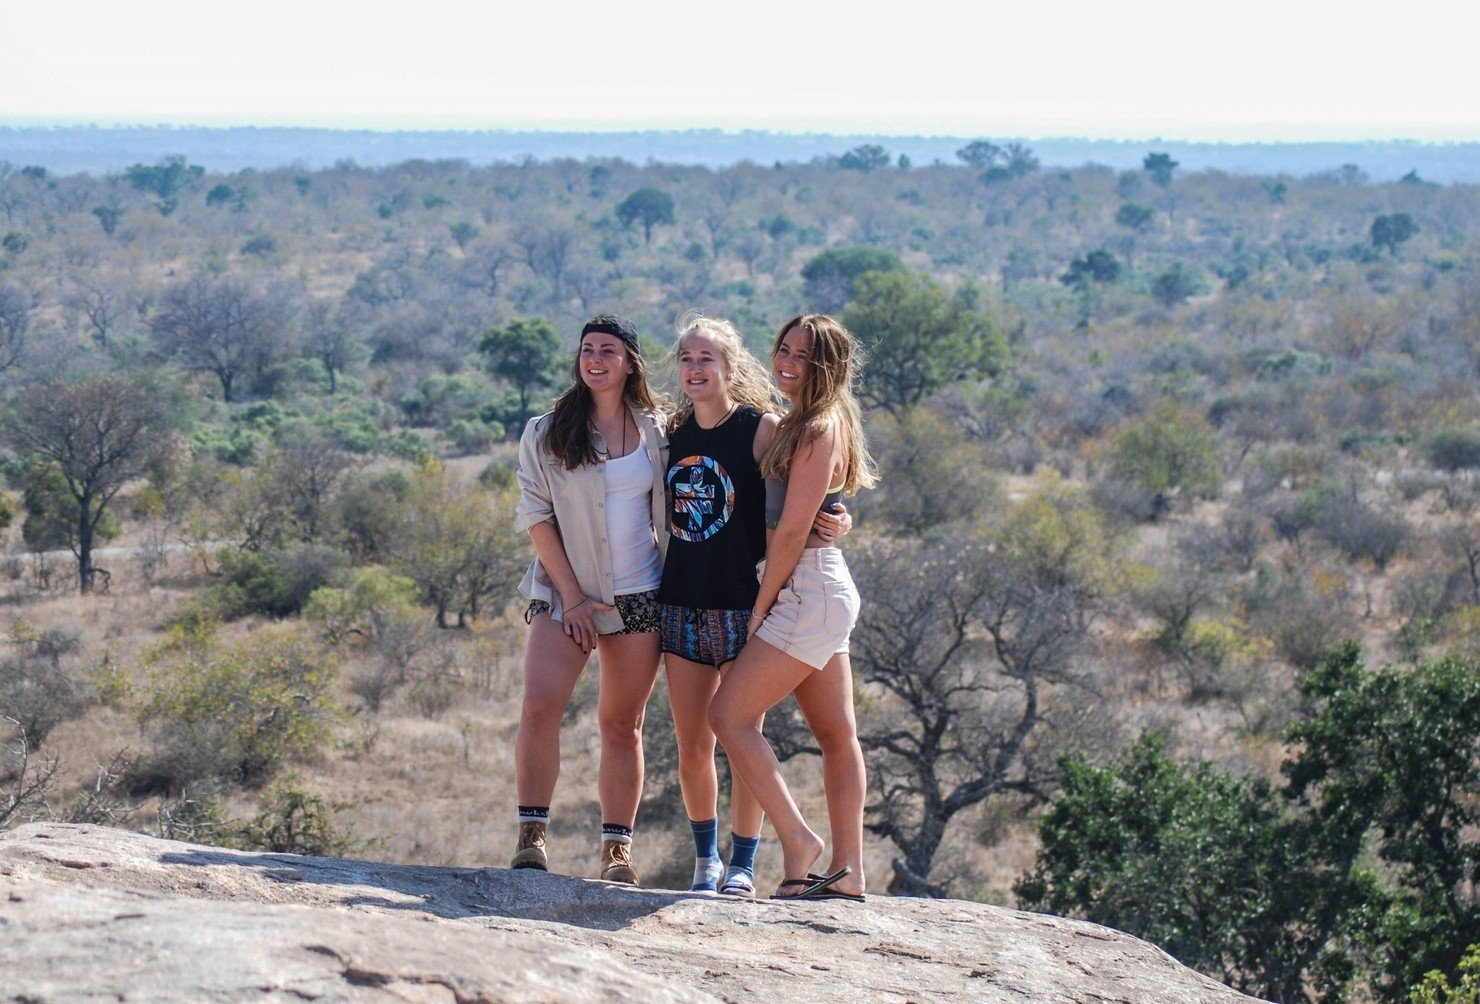 South Africa Wild Adventure